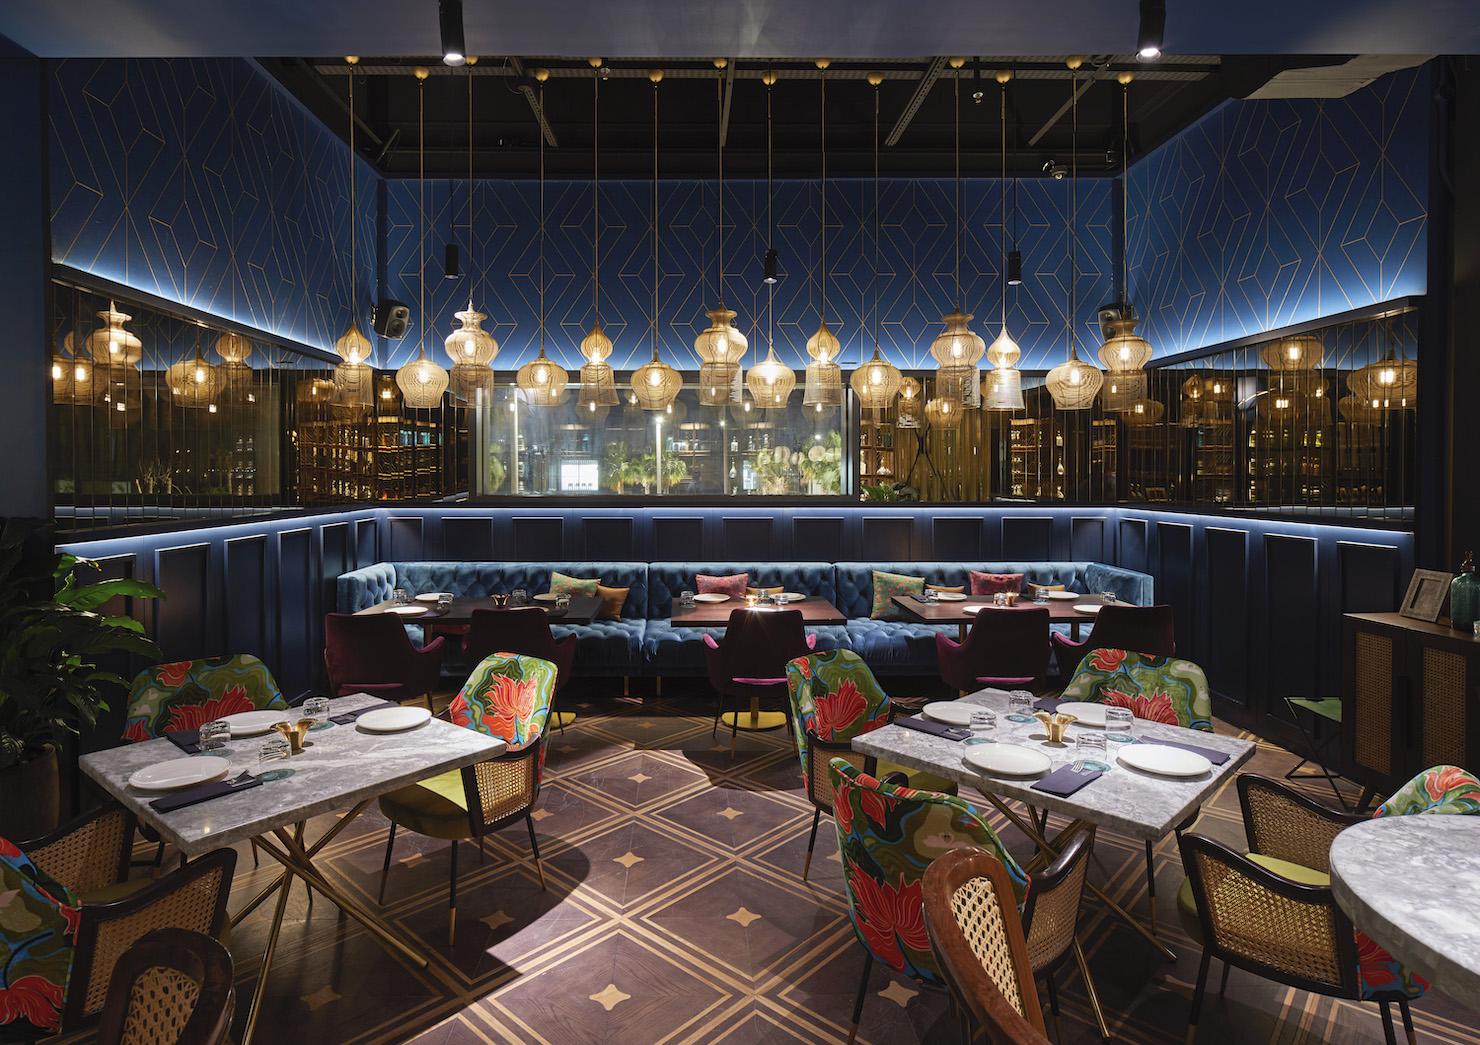 Séparation De Cuisine Bar masti cocktails & cuisine || eclectic indian-inspired